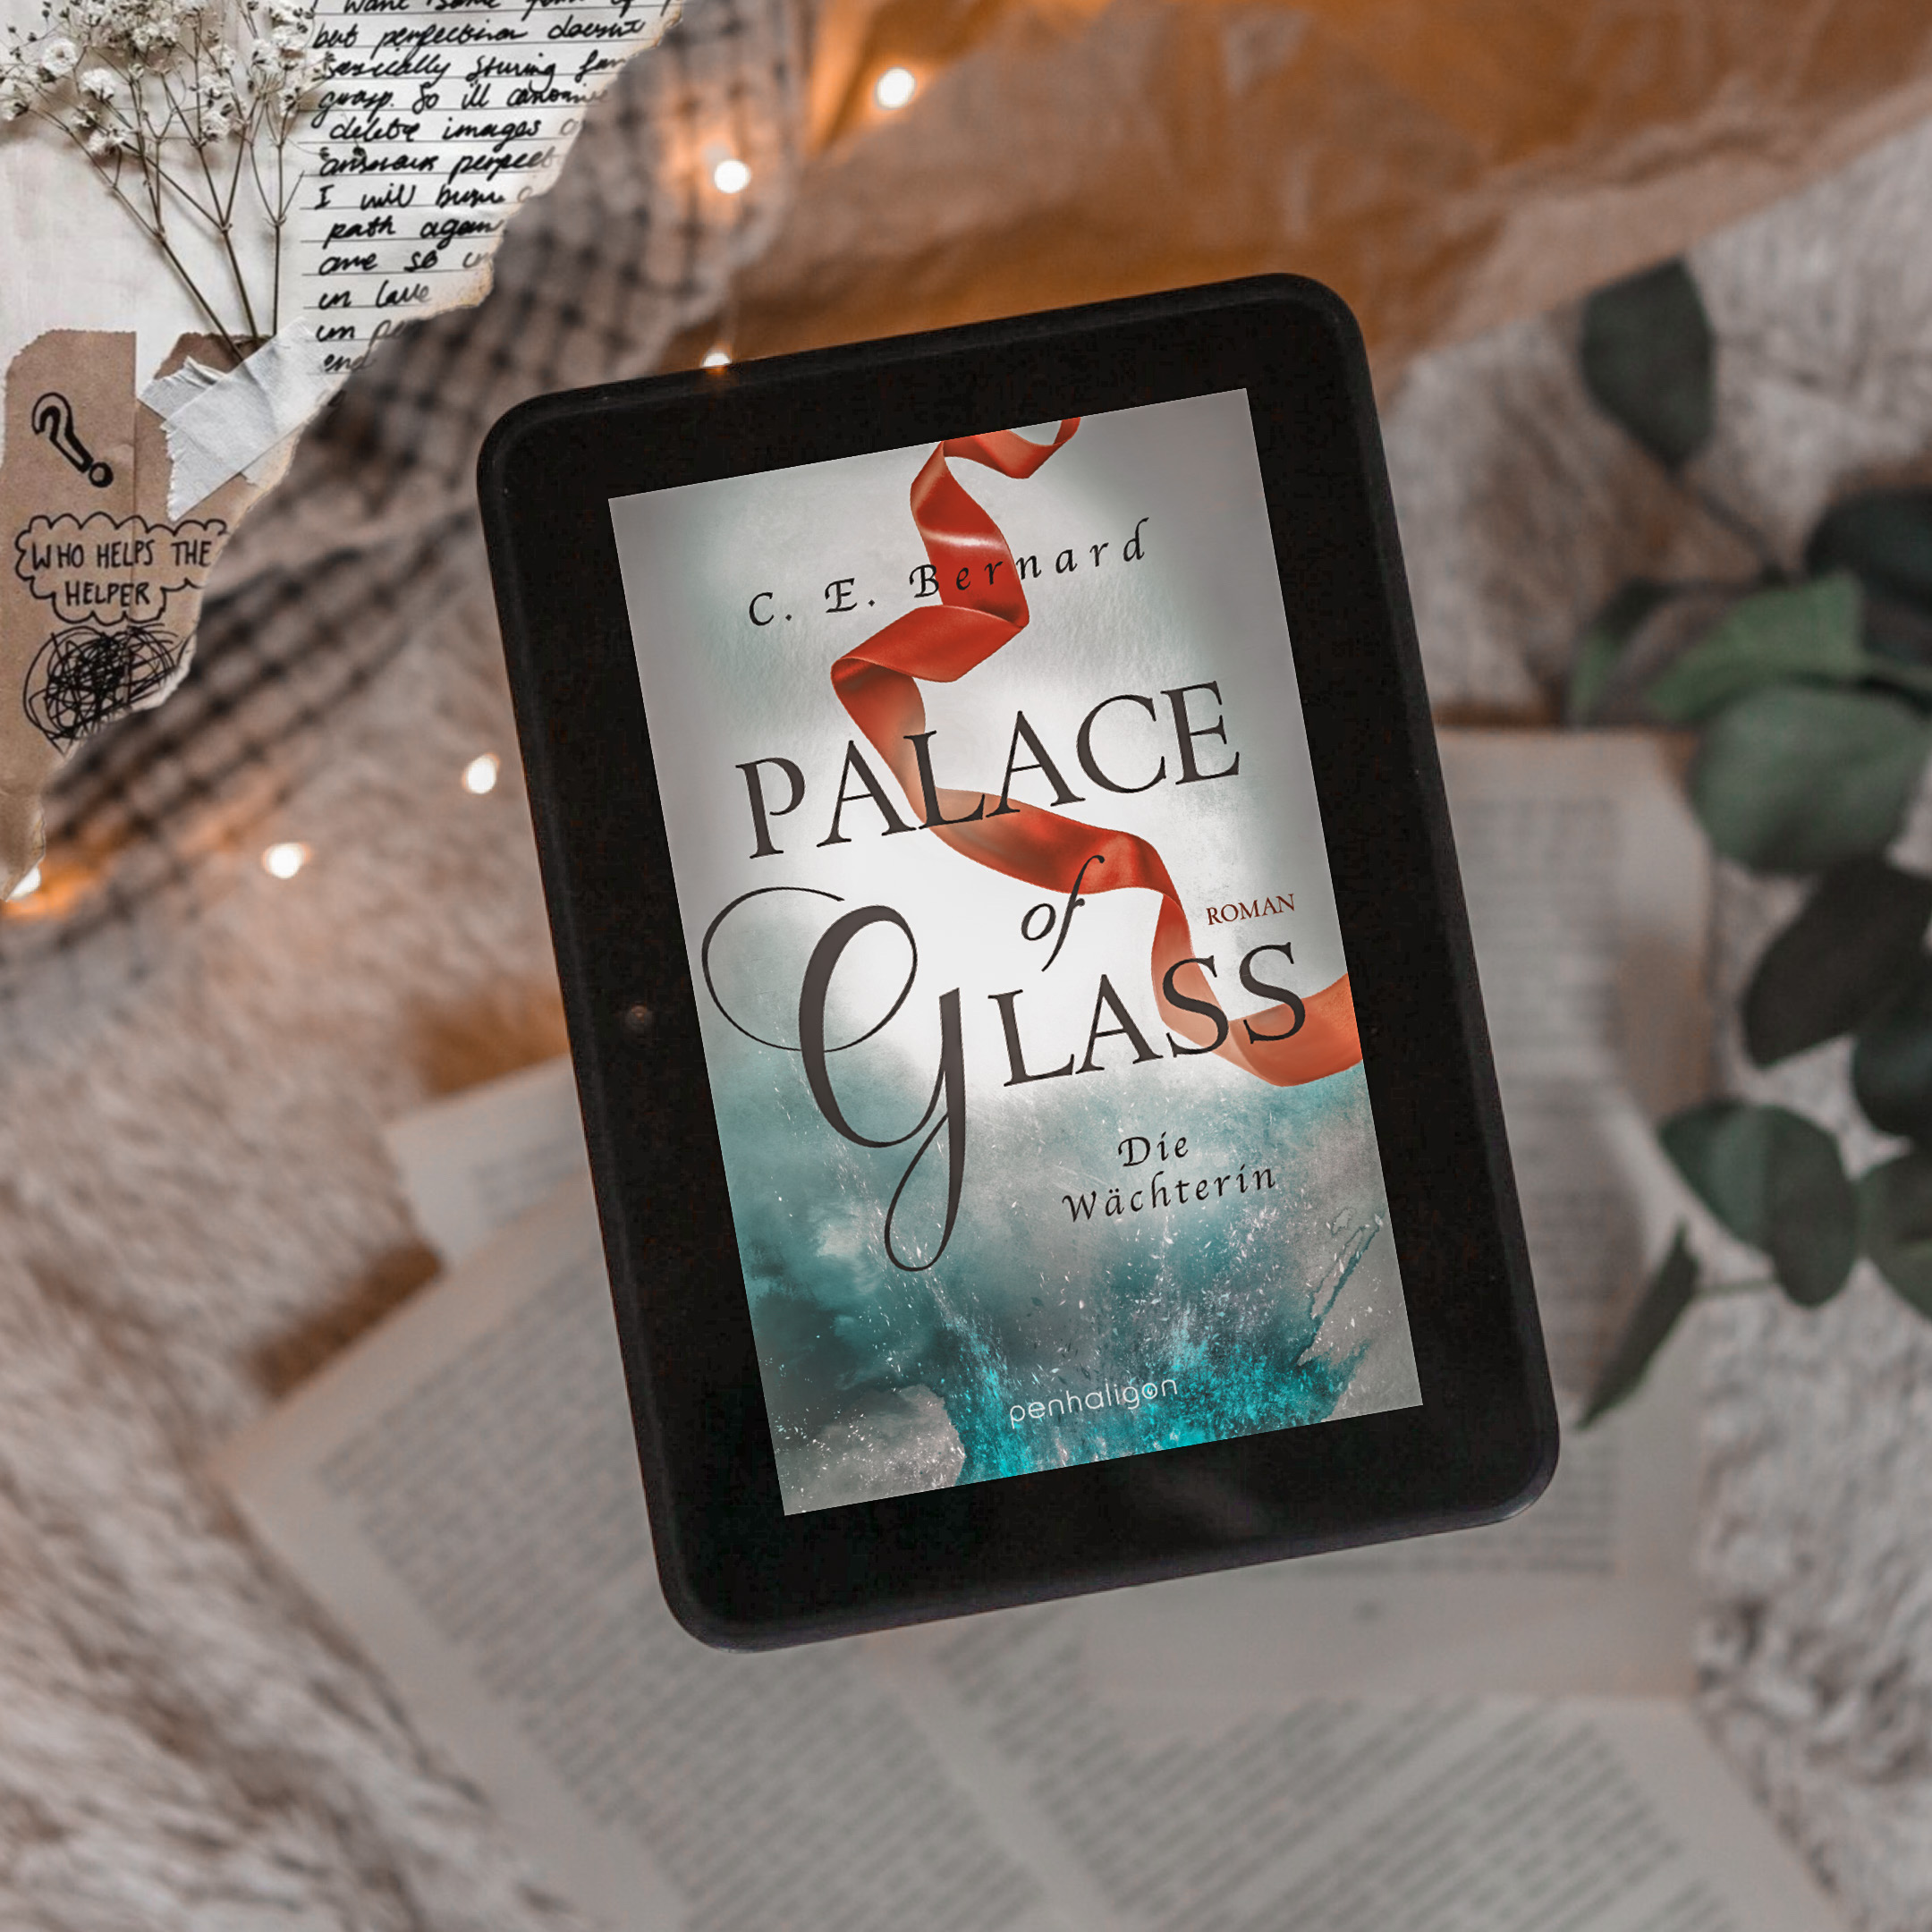 Palace of Glass – Die Wächterin   C.E. Bernard